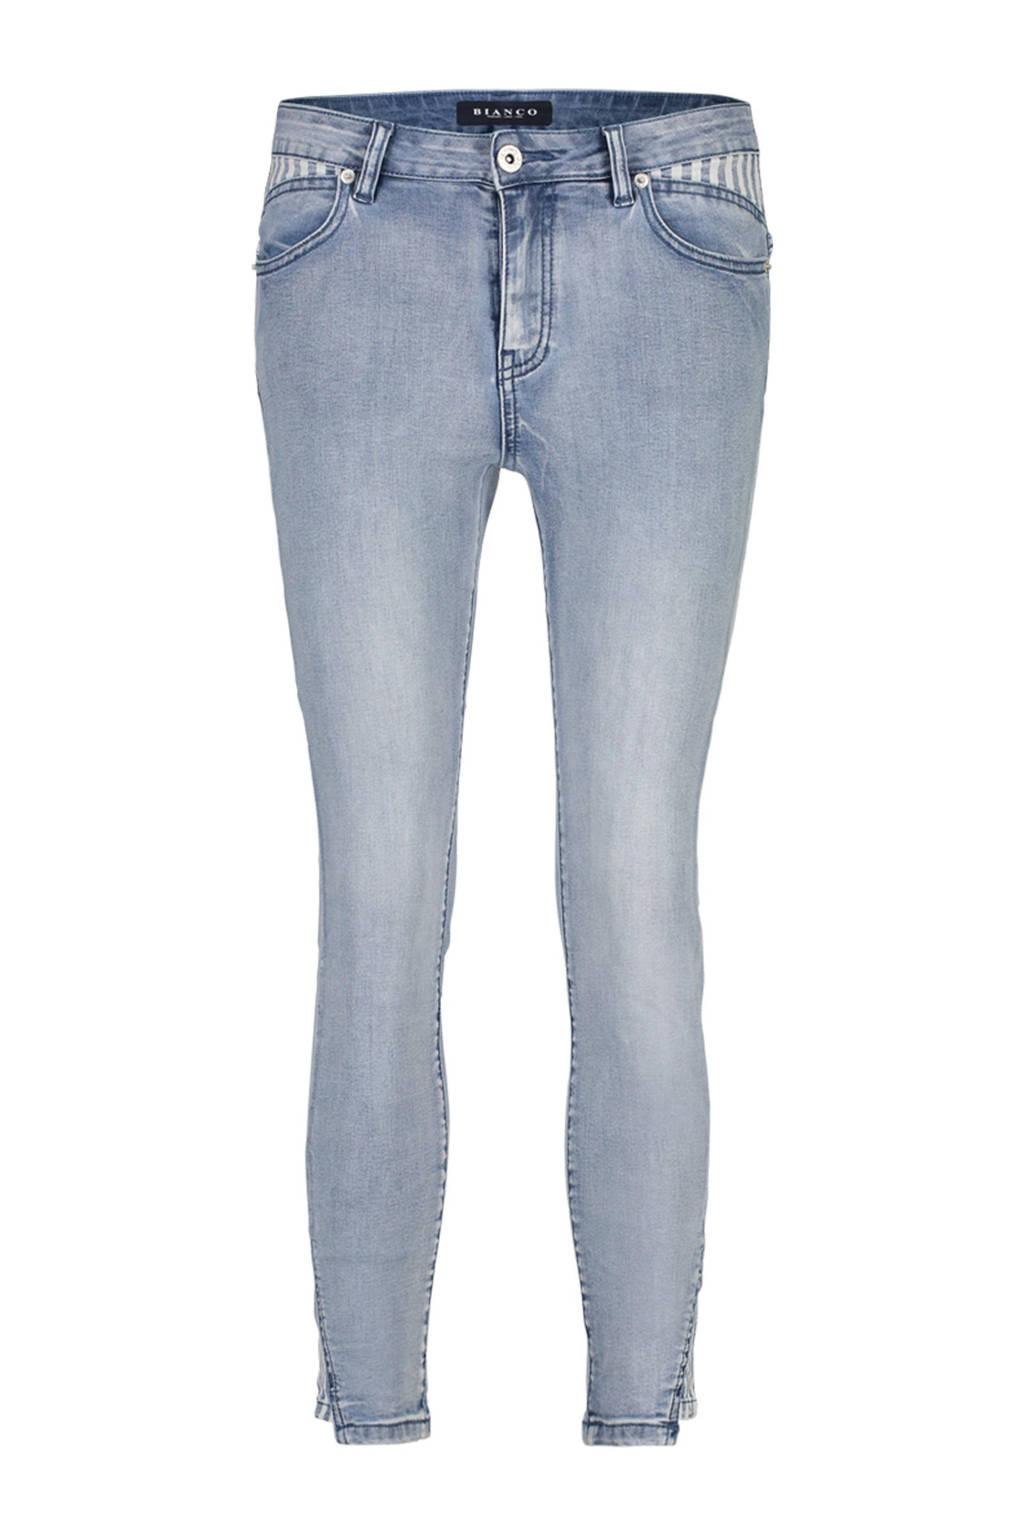 Bianco Jeans skinny fit jeans Lux met contrasterende details, Blauw